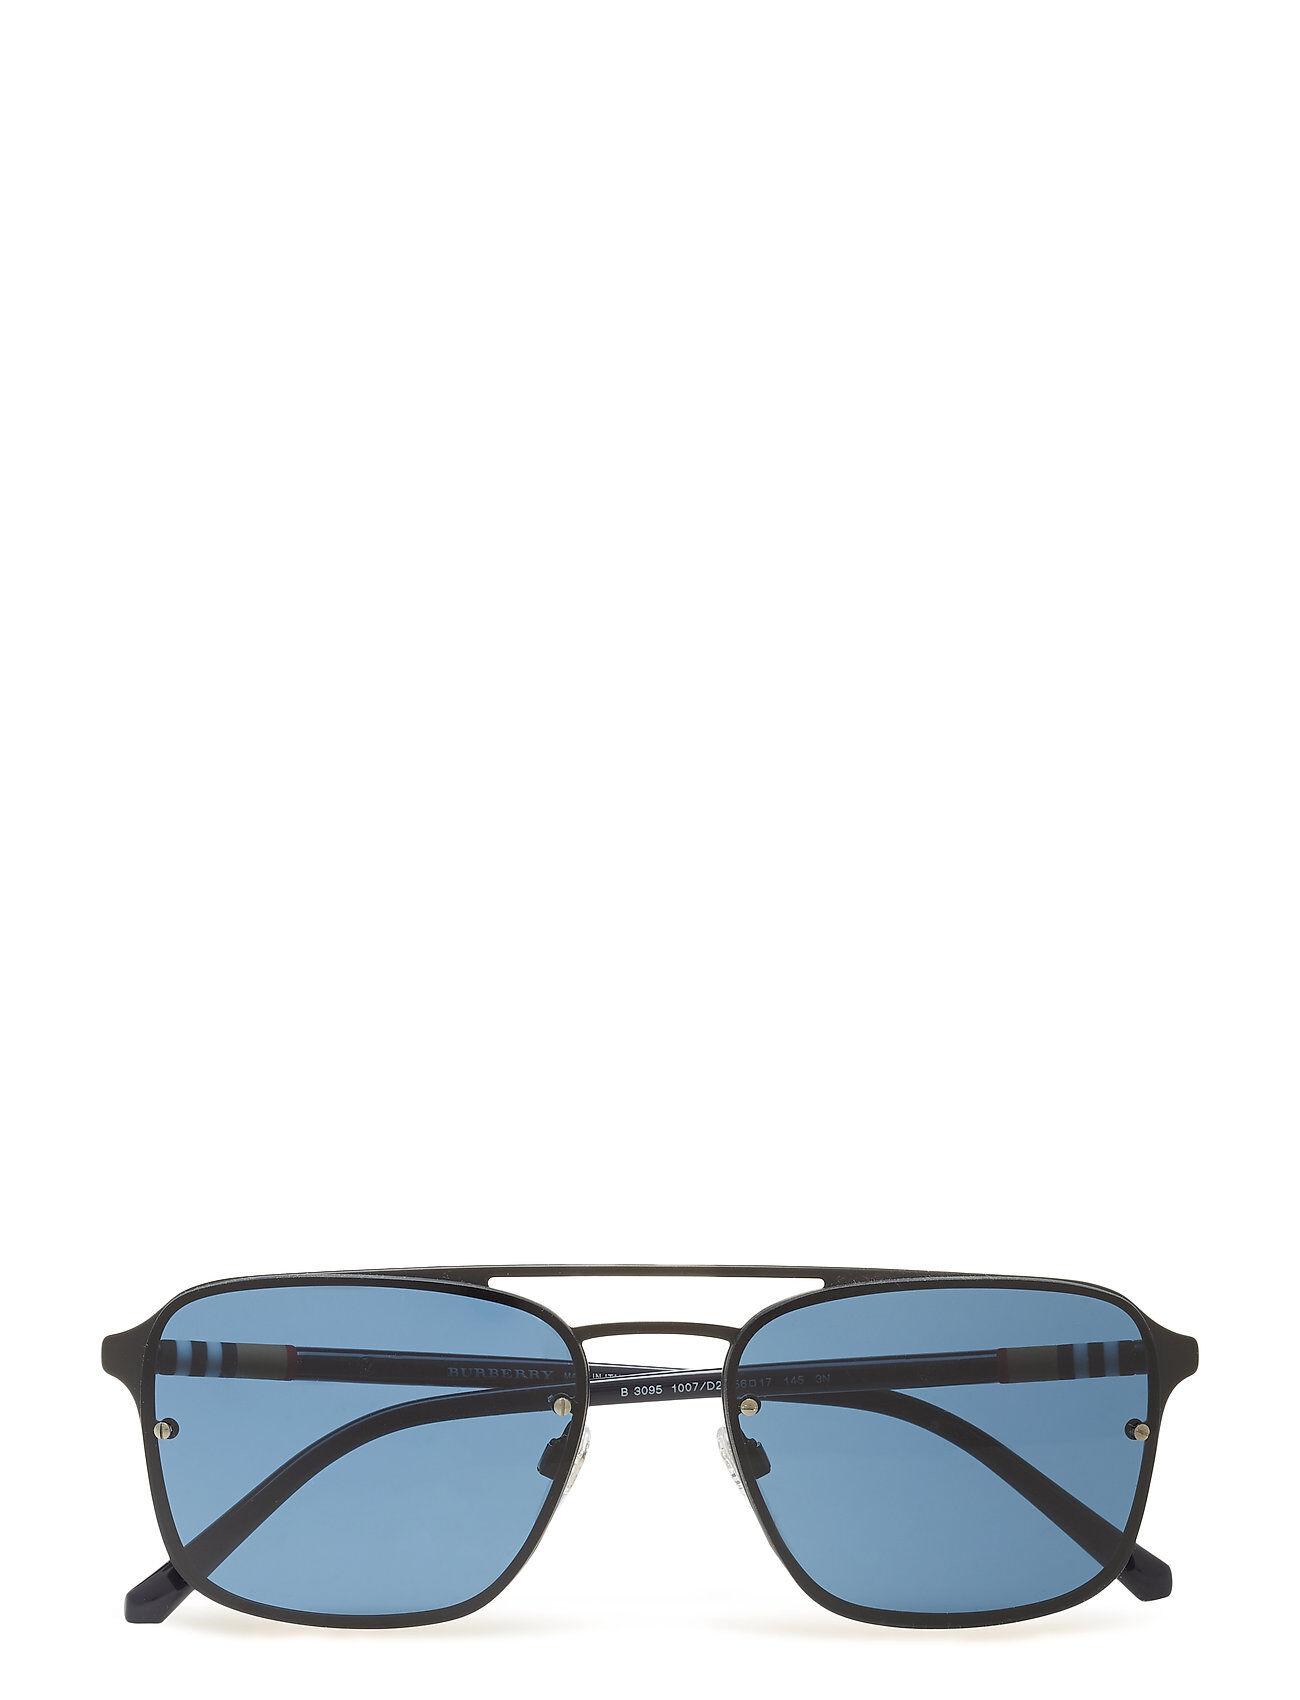 Image of Burberry Sunglasses 0be3095 Pilottilasit Aurinkolasit Sininen Burberry Sunglasses